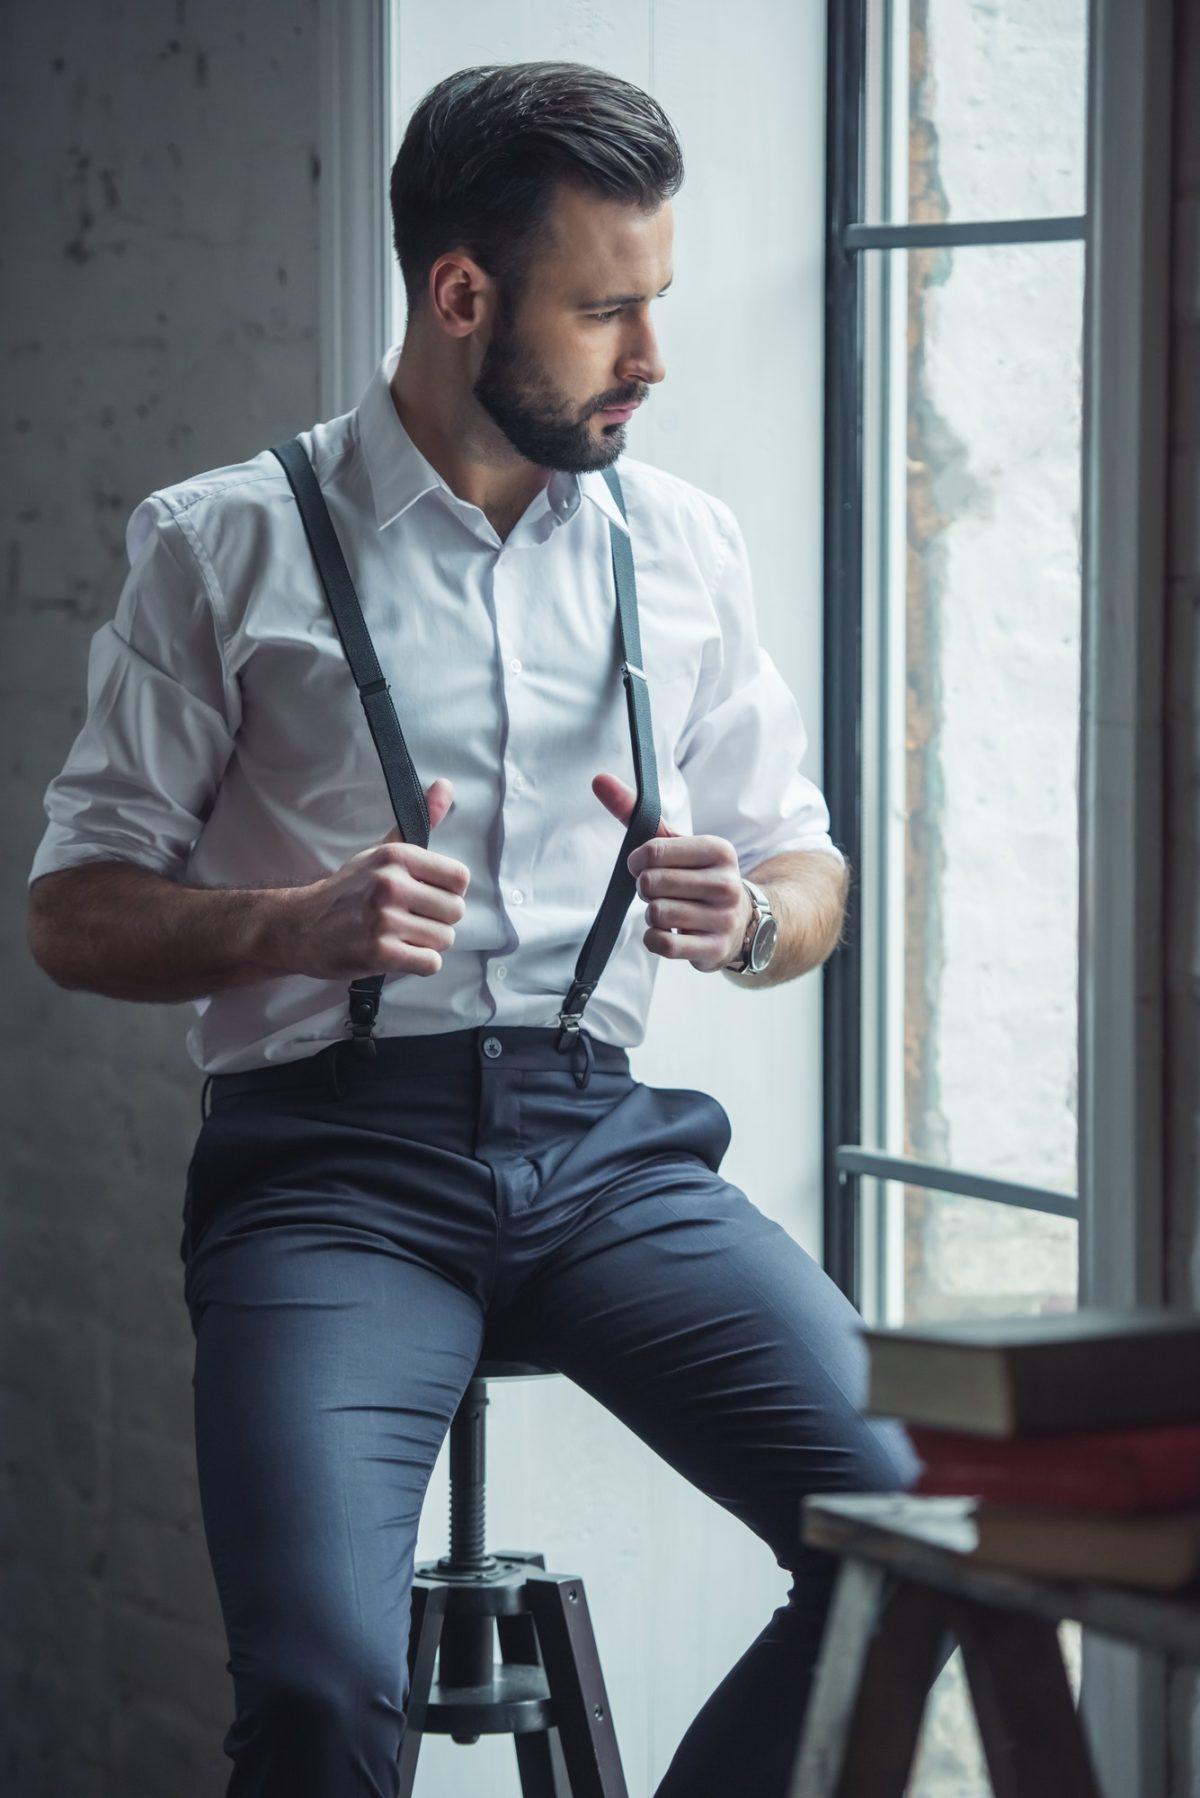 Stylish confident man